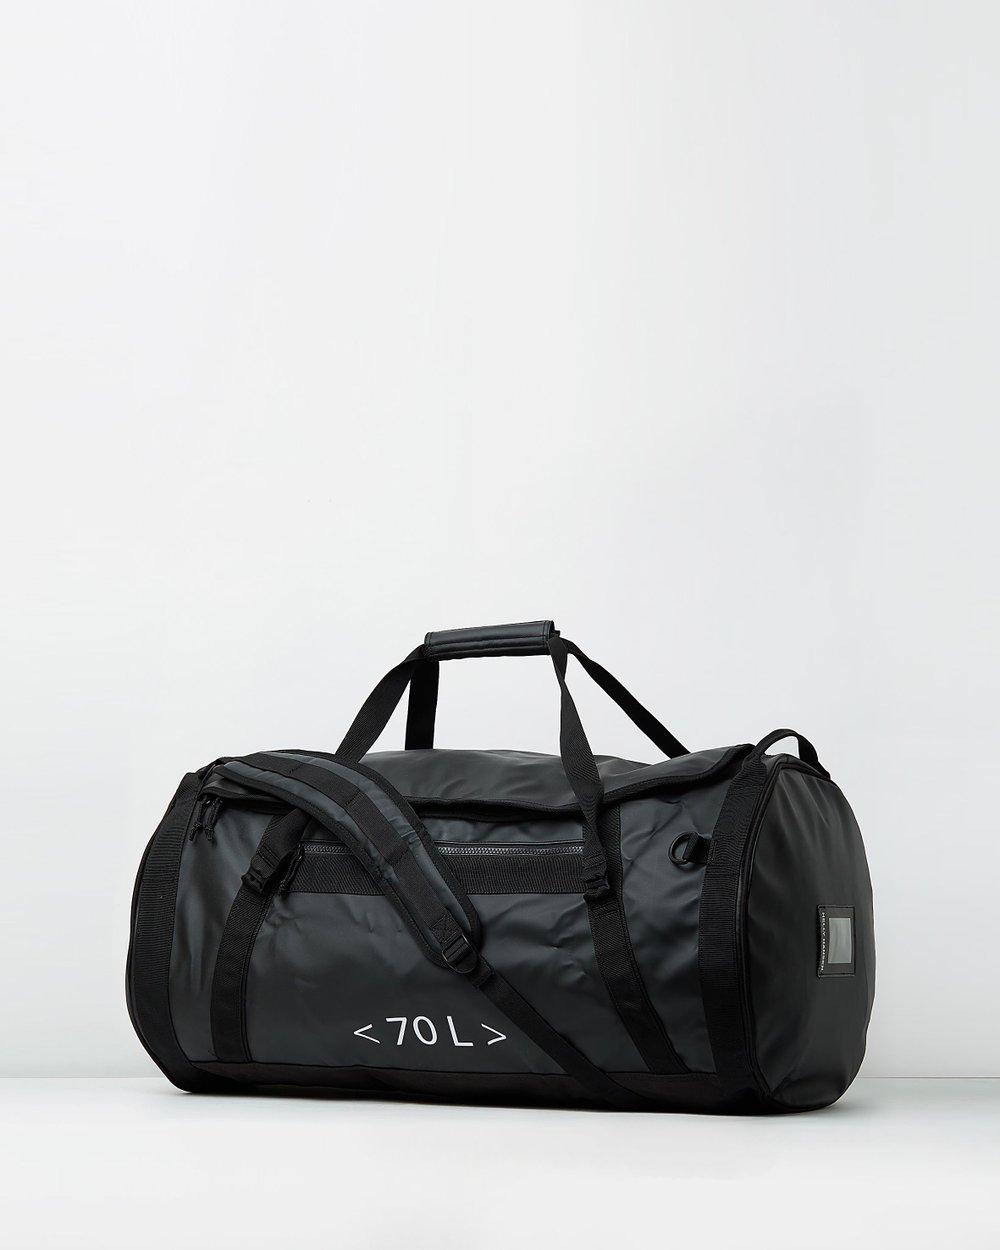 HH Duffle Bag 2 70L by Helly Hansen Online  4399bfe694b8b